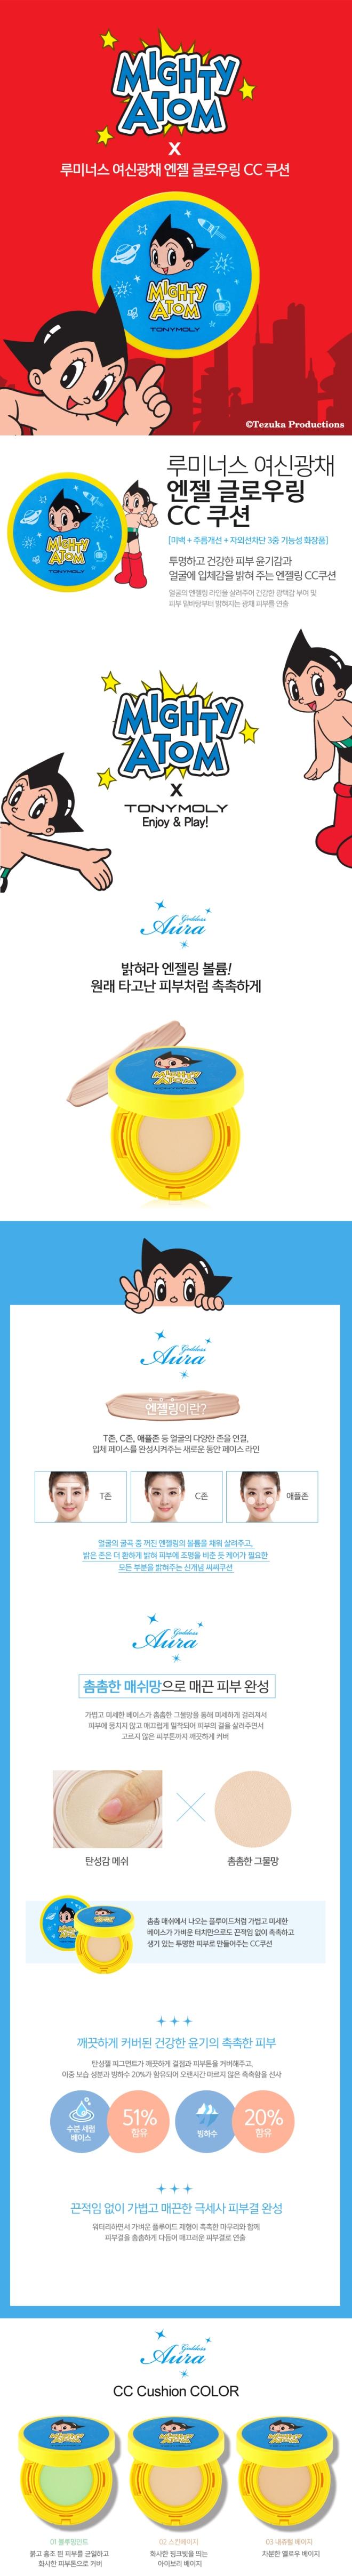 Tonymoly x Mighty Atom Luminous Goddess Aura Angel Glowring CC Cushion (Info - Korea)